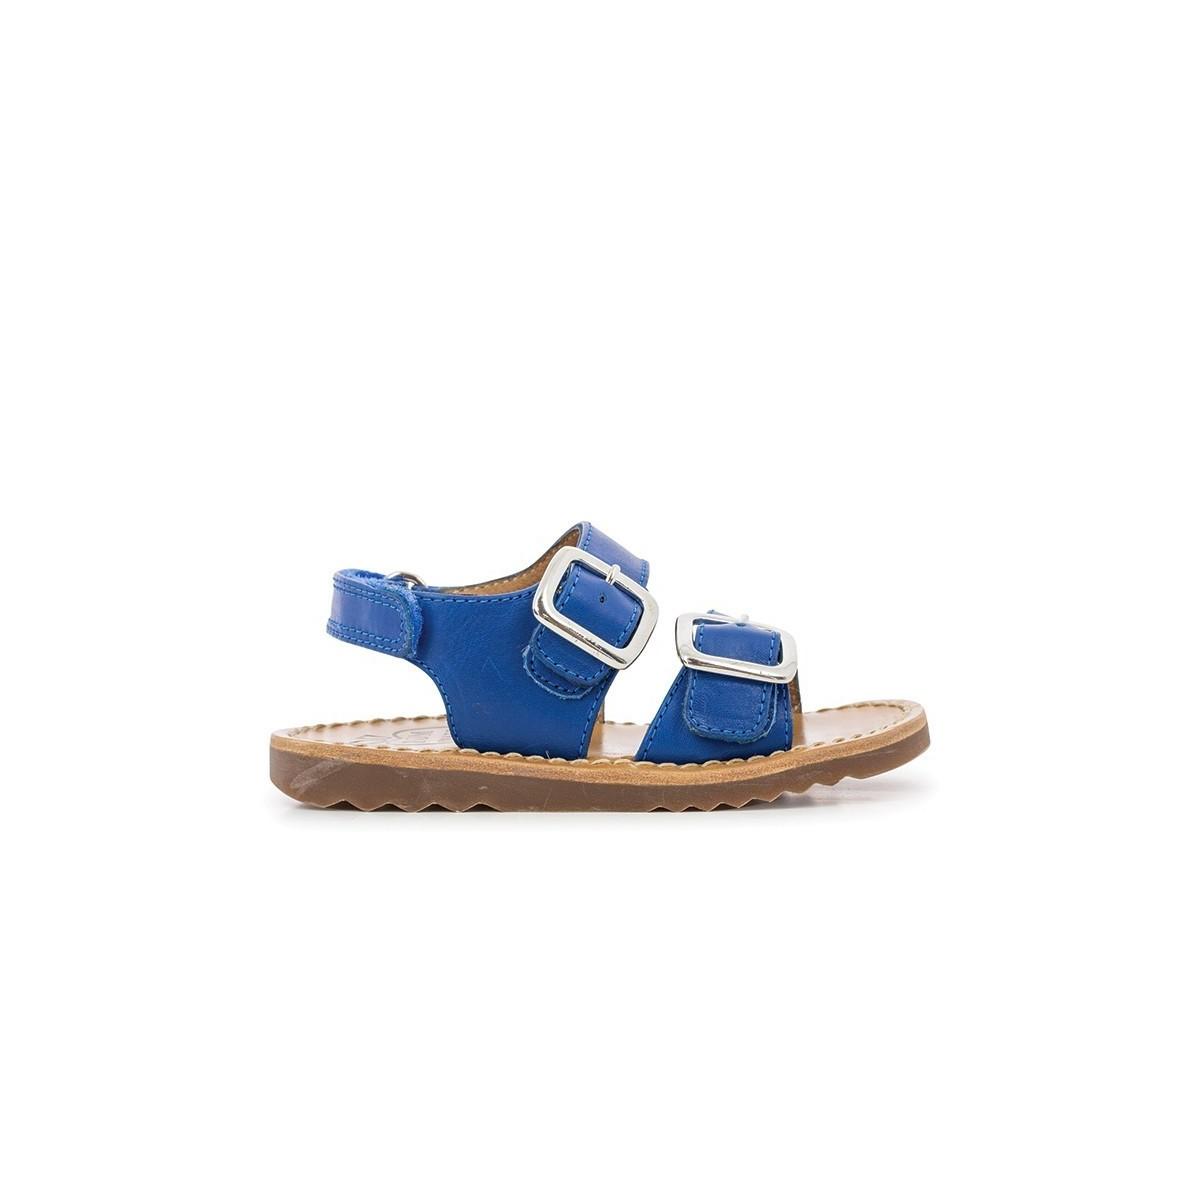 Sandale 2 boucles Ultra Bleu